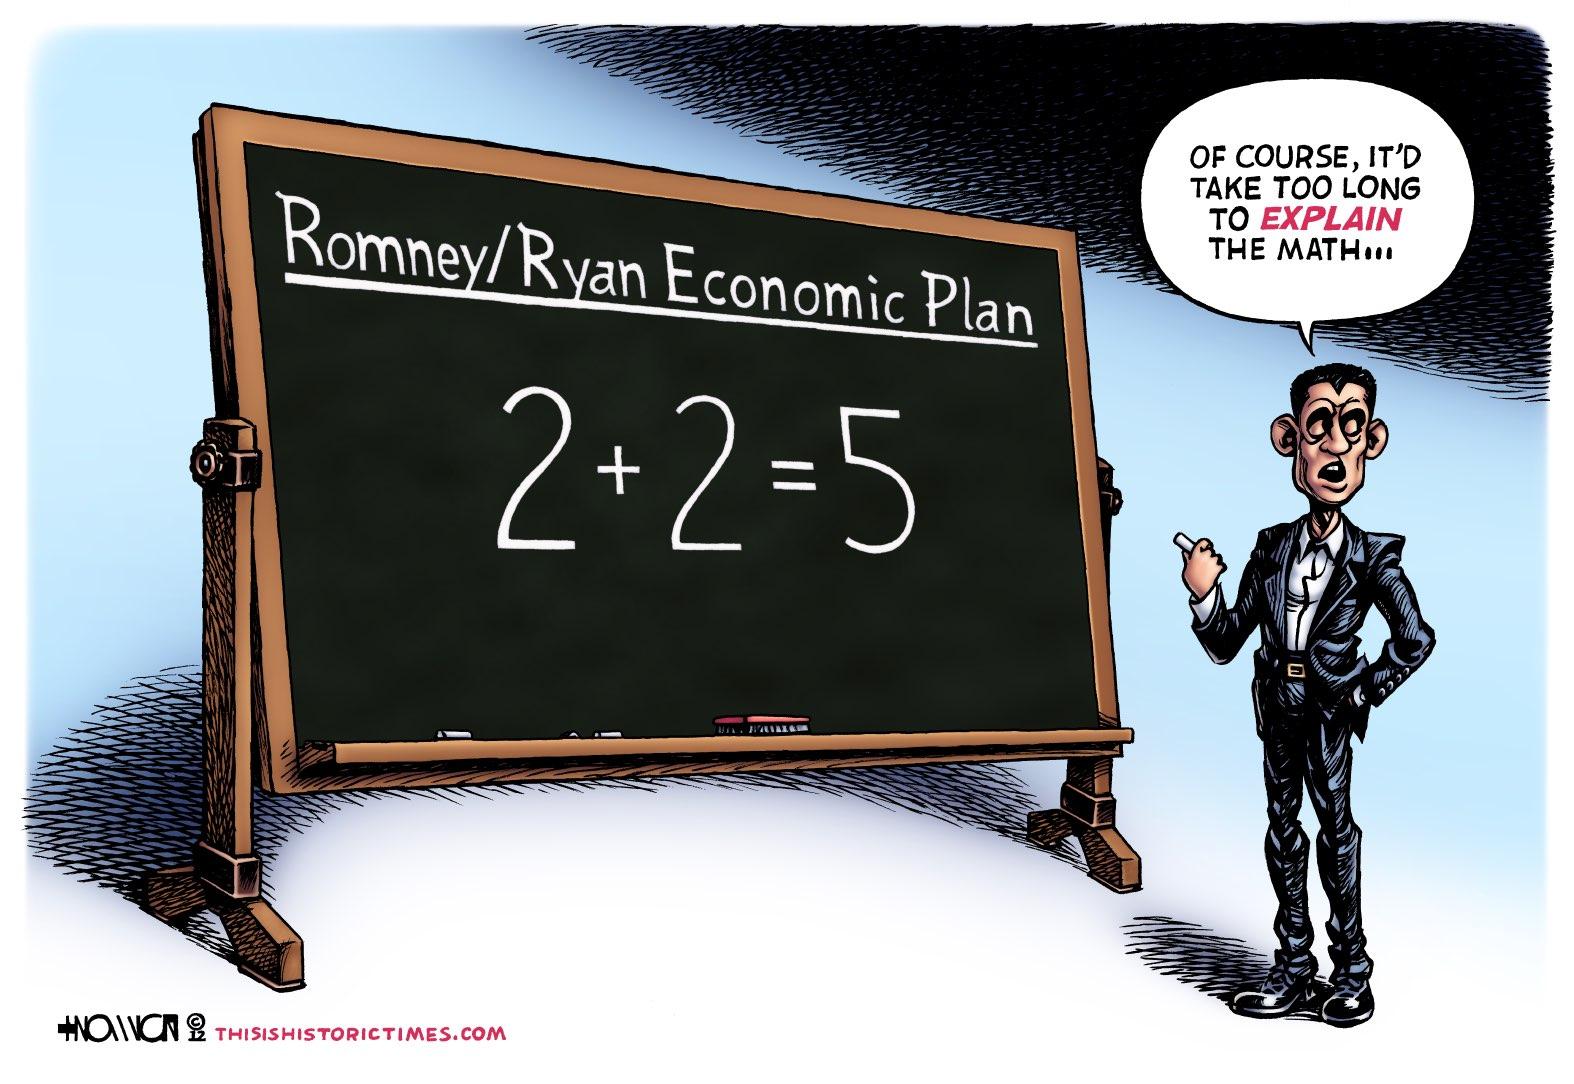 Romney/Ryan 'Rithmetic